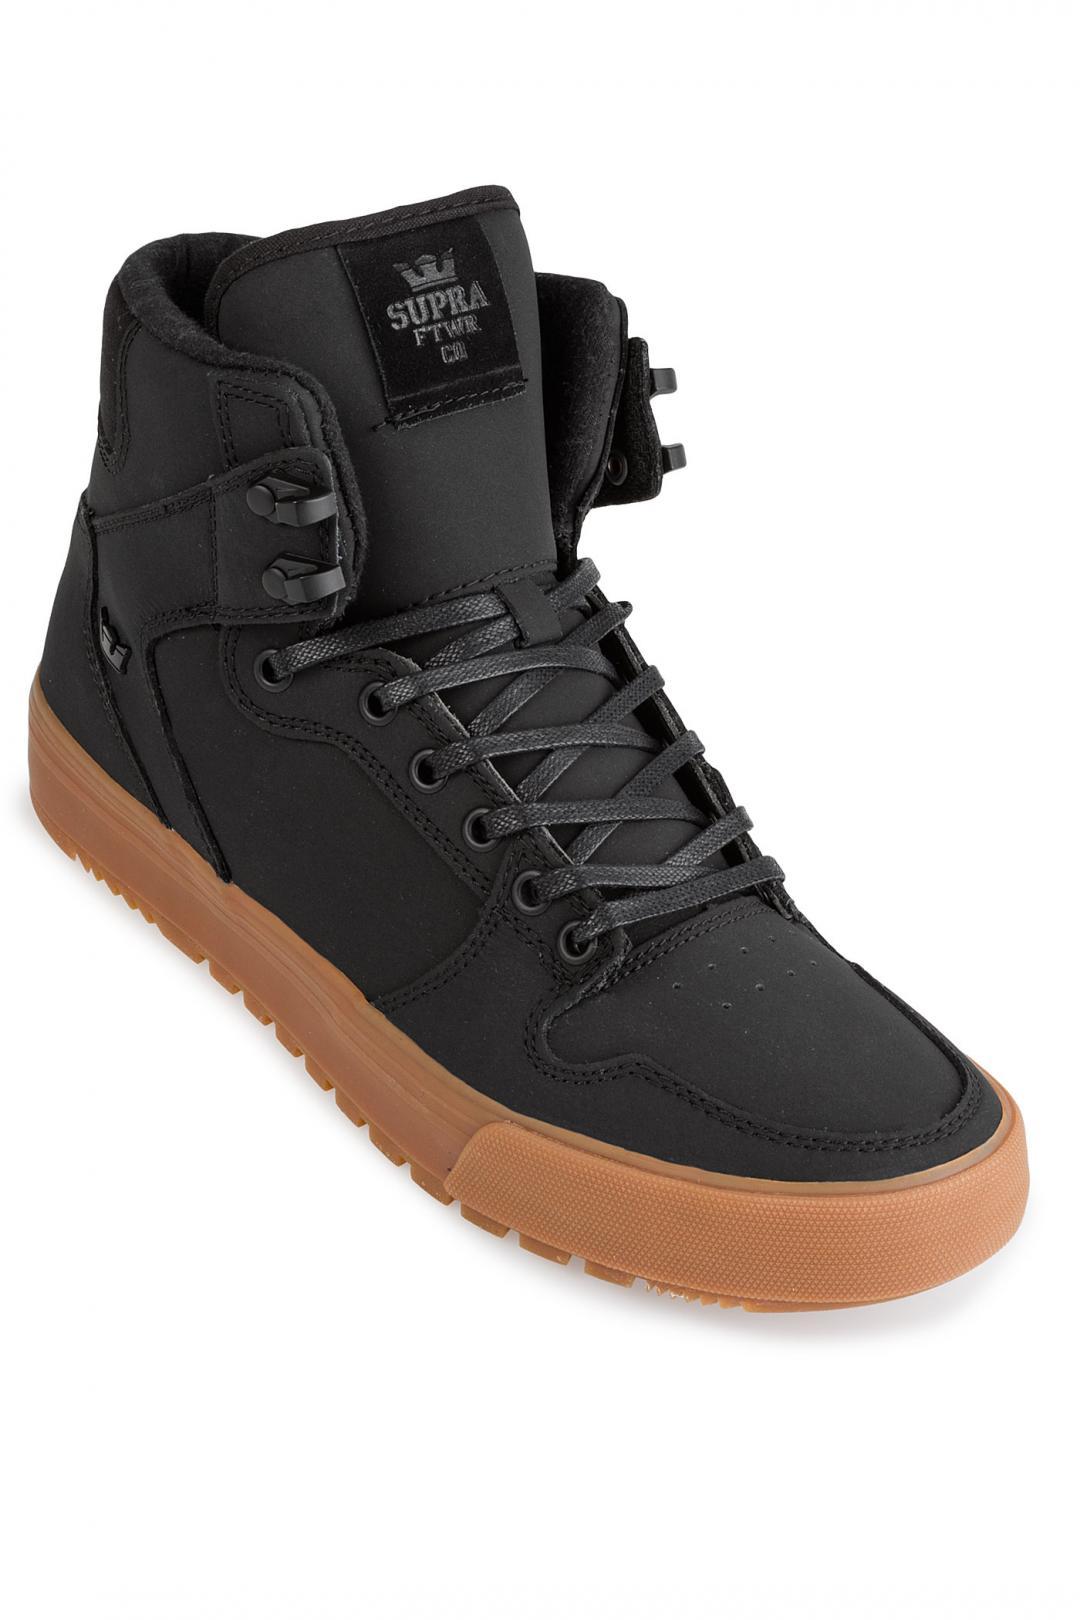 Uomo Supra Vaider CW black black gum   Sneakers high top